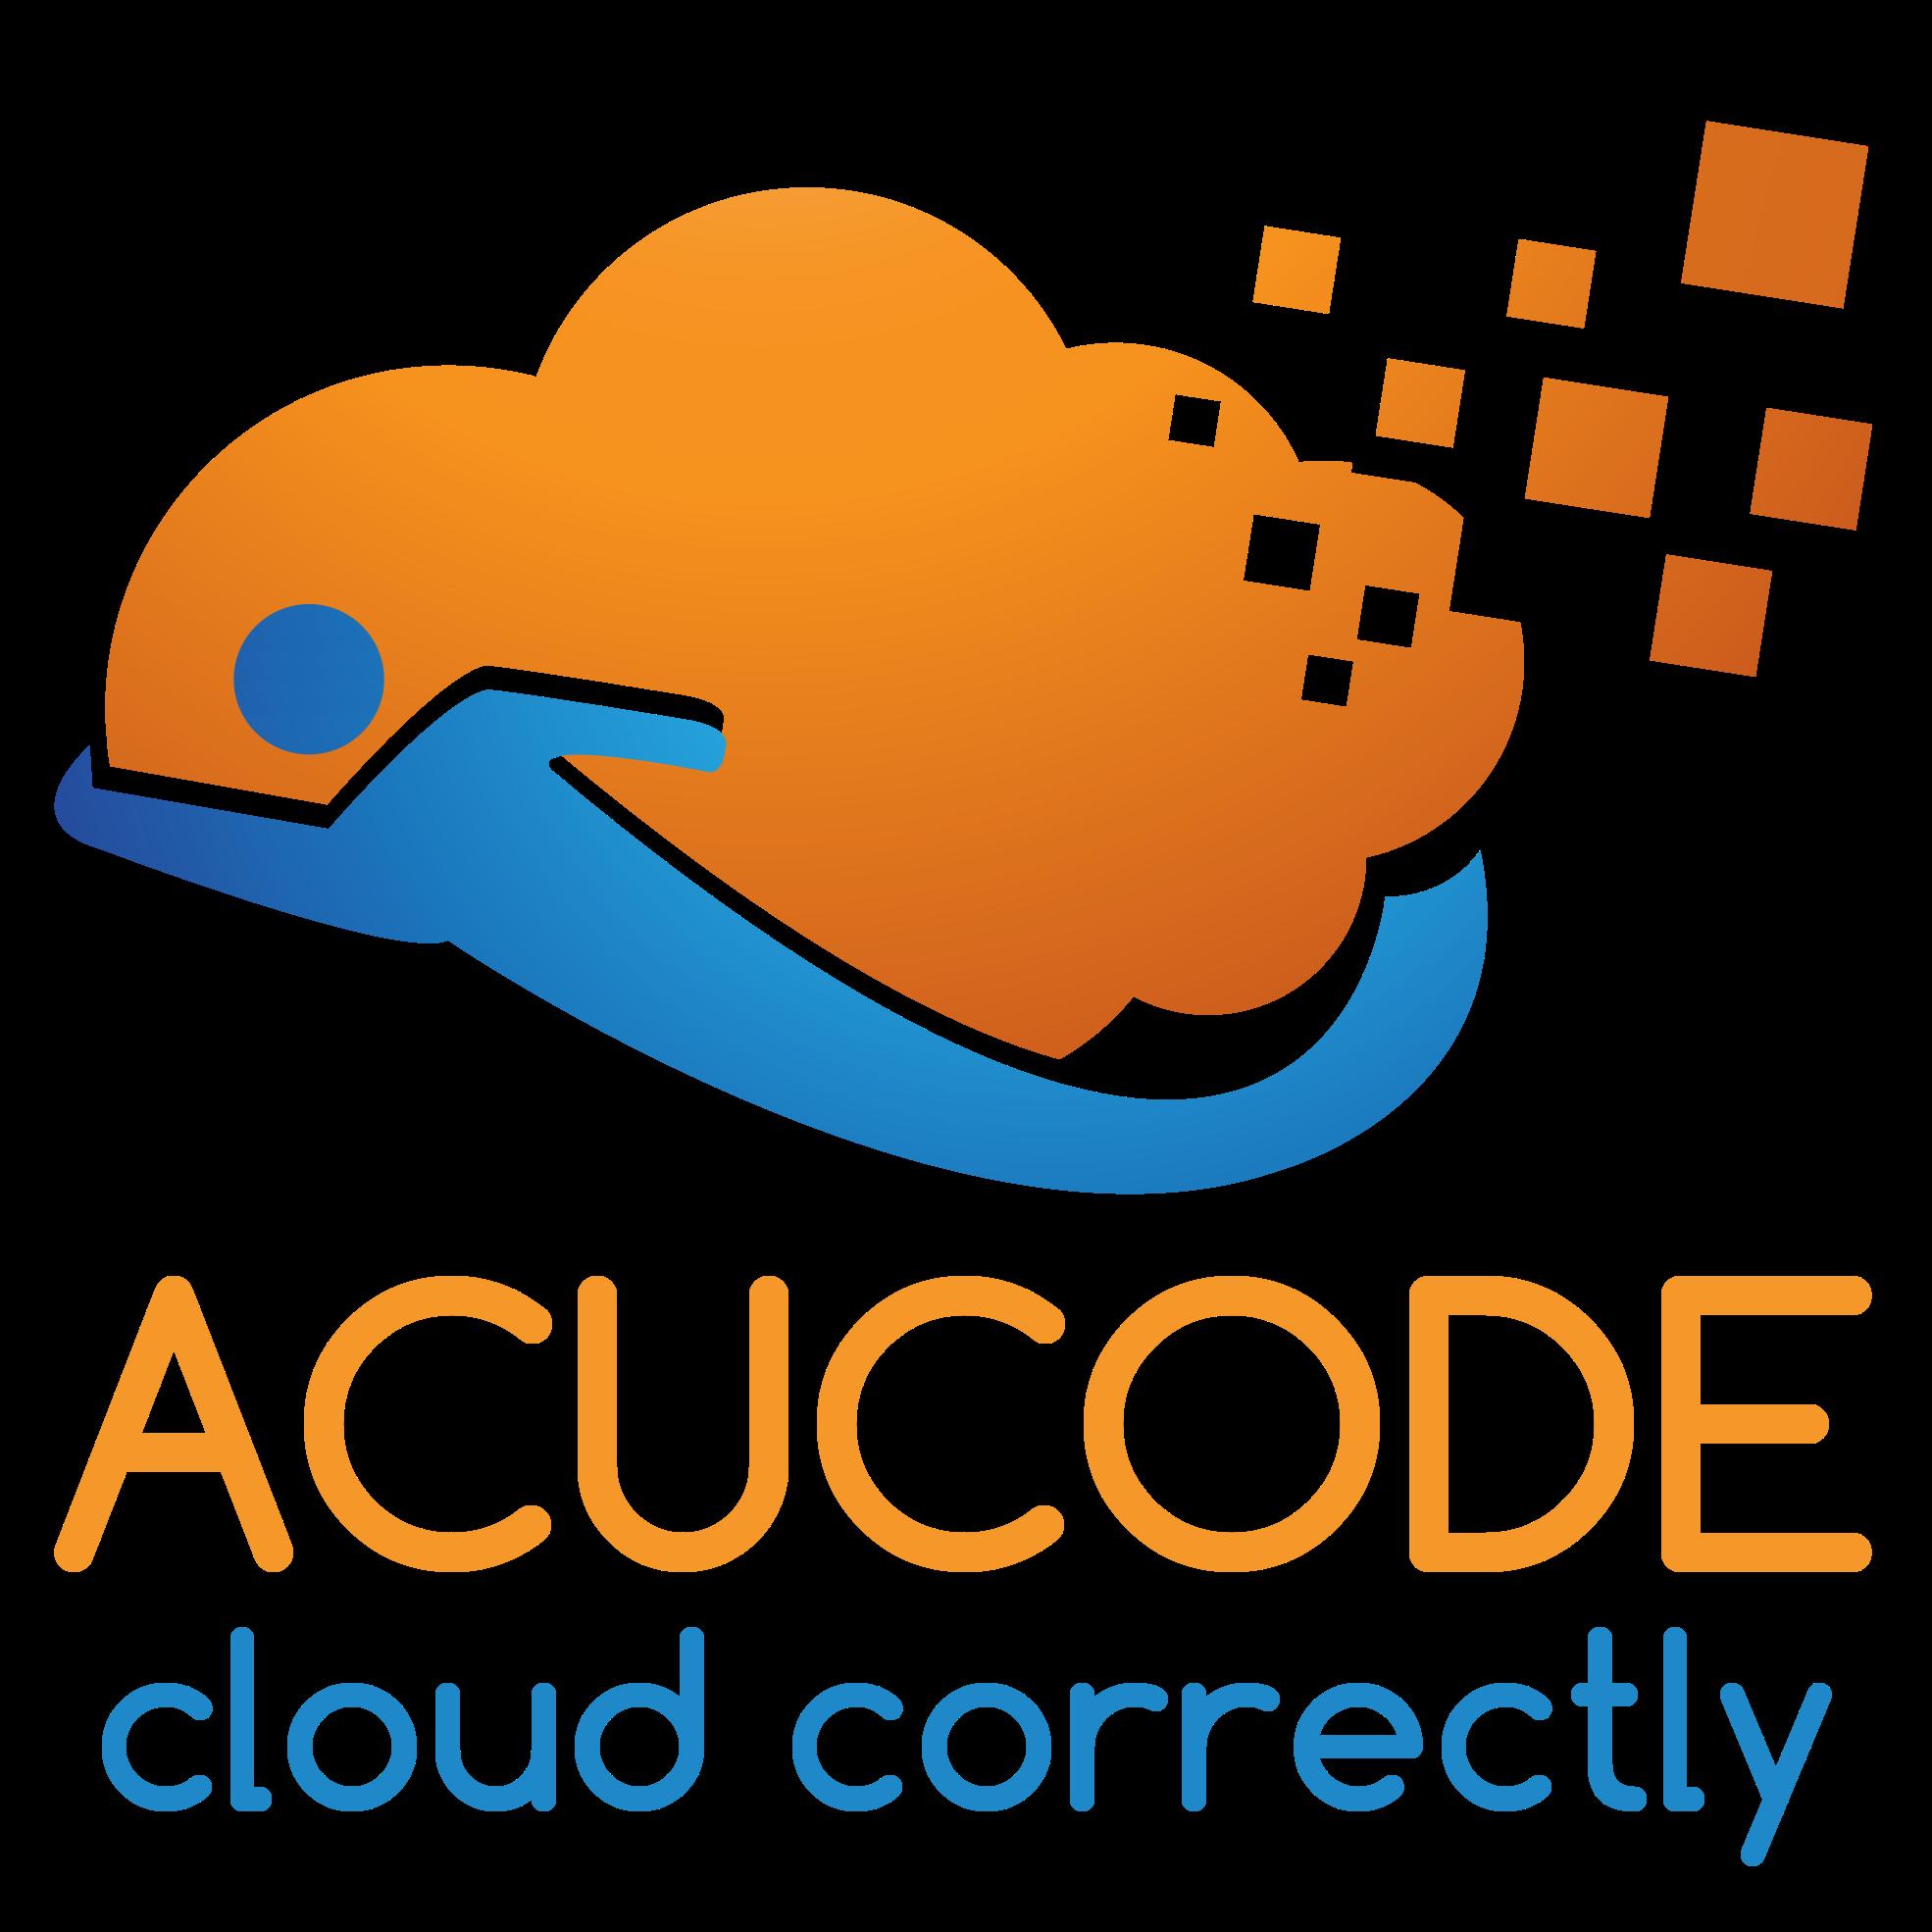 Acucode llc